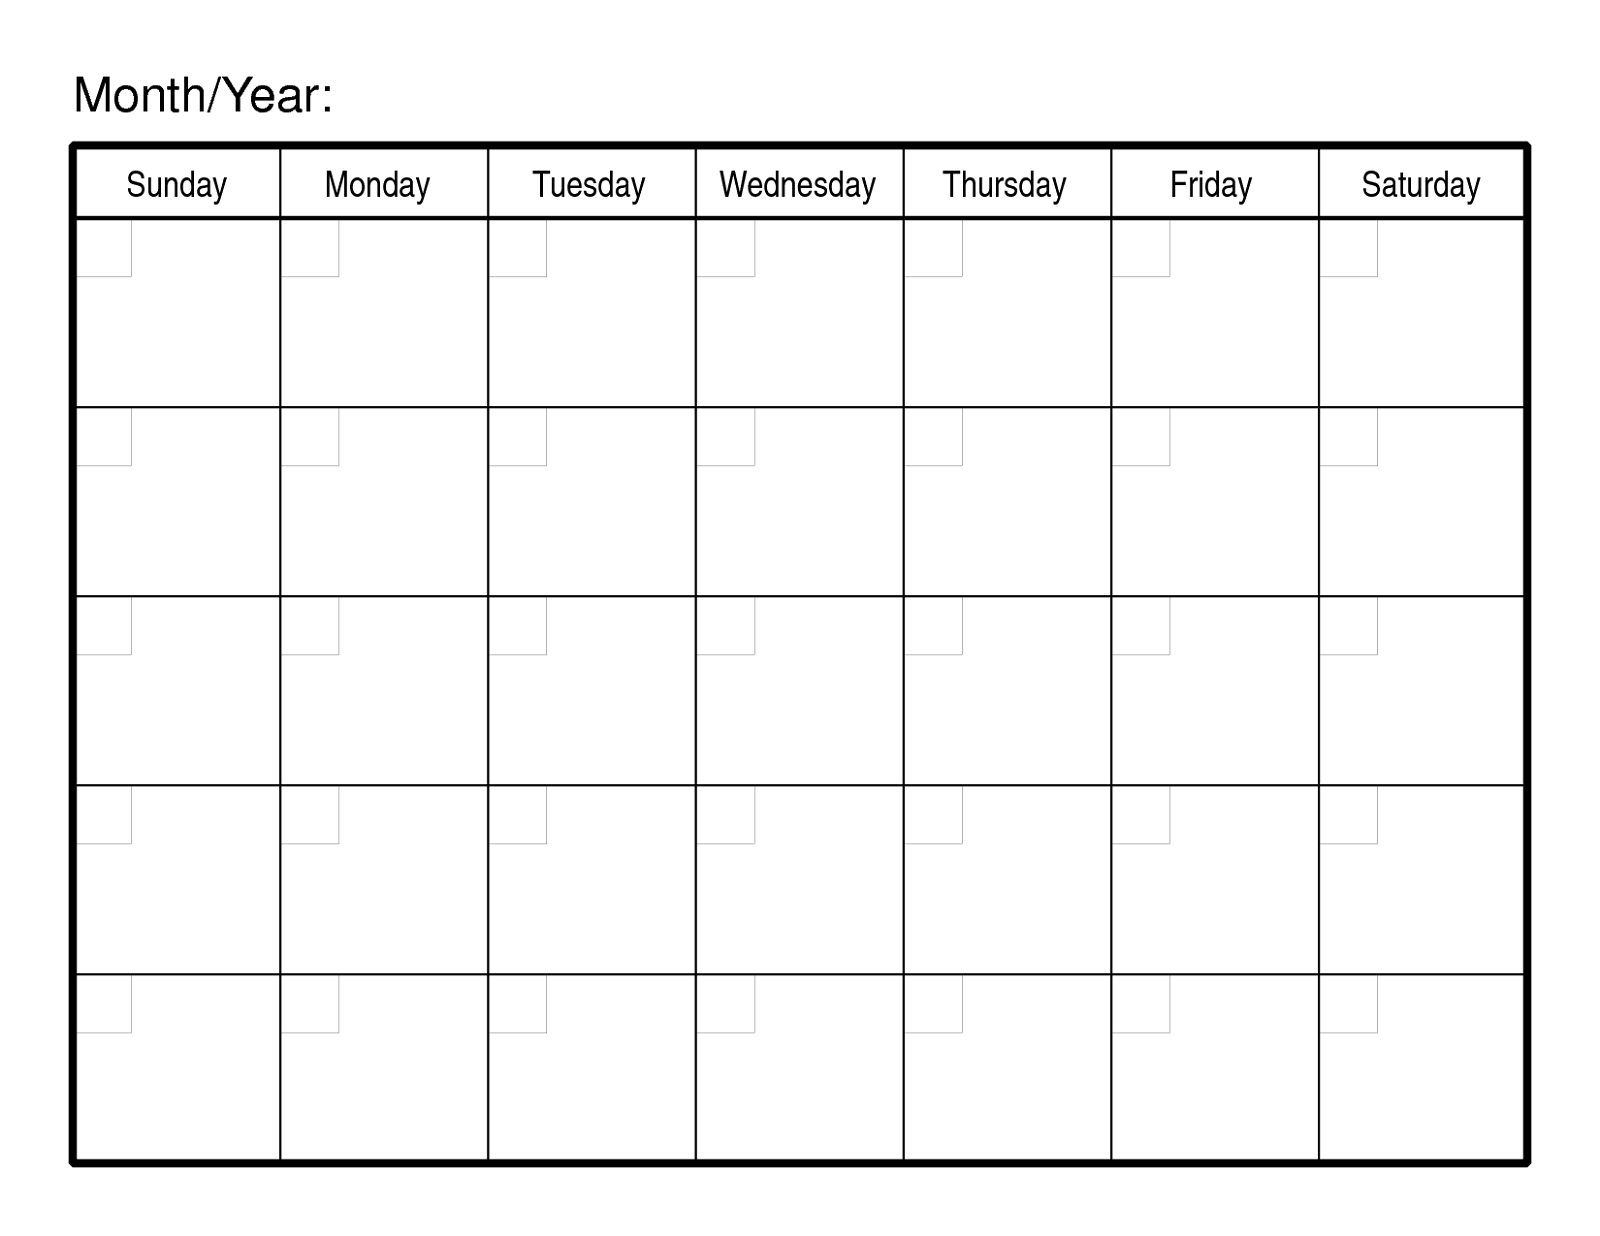 Sample Calendars To Print   Printable Blank Calendar, Free 1 Week Blank Editable Calendar